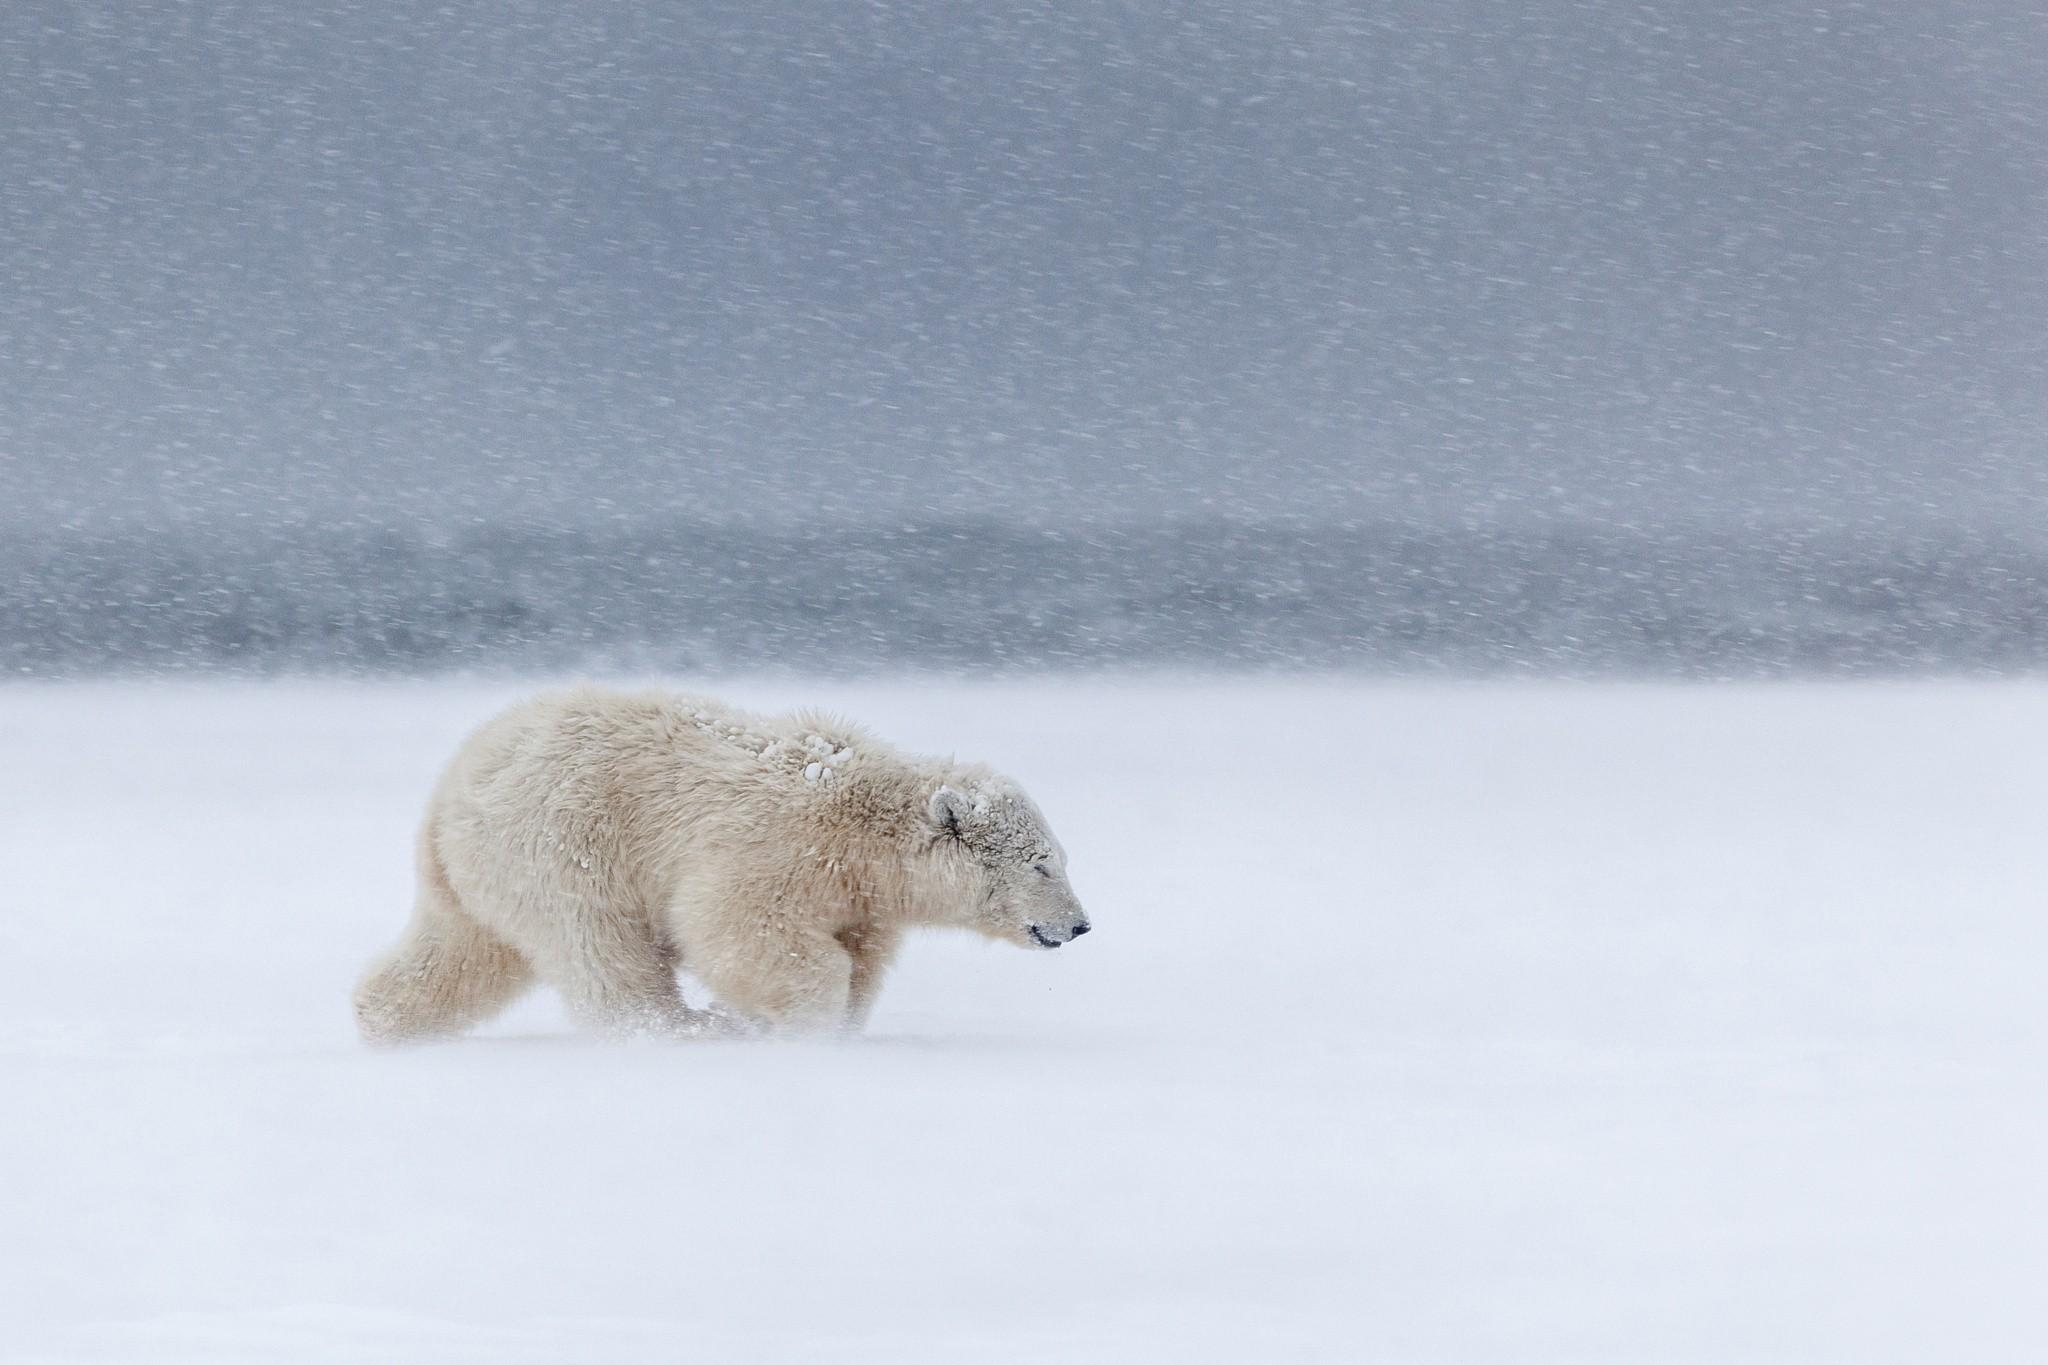 Animals Snow Winter Polar Bears Arctic Mammals Fox Freezing Grizzly Bear Tundra Weather Mammal